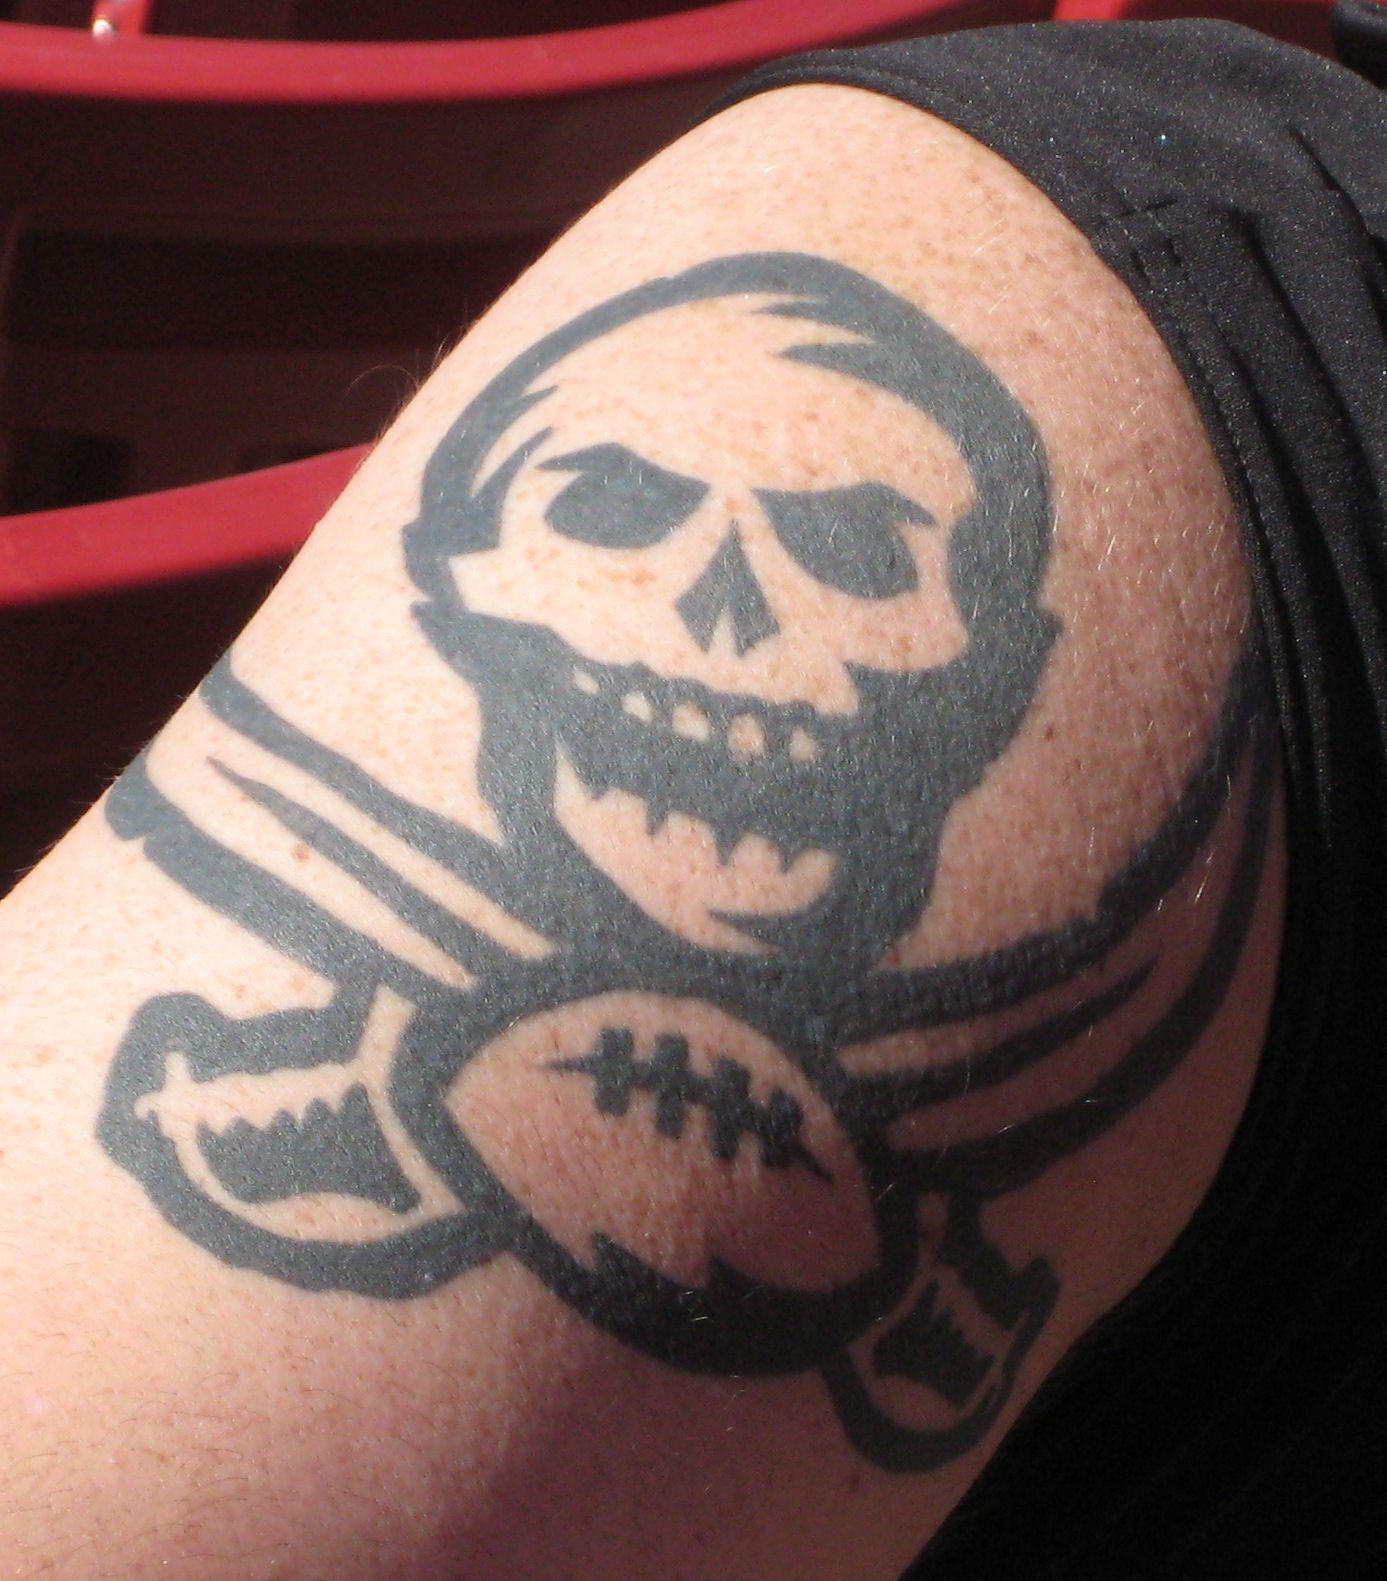 Tampa Bay Buccaneers Tattoos Images Google Search Tampa Bay Buccaneers Tattoo Images Buccaneers